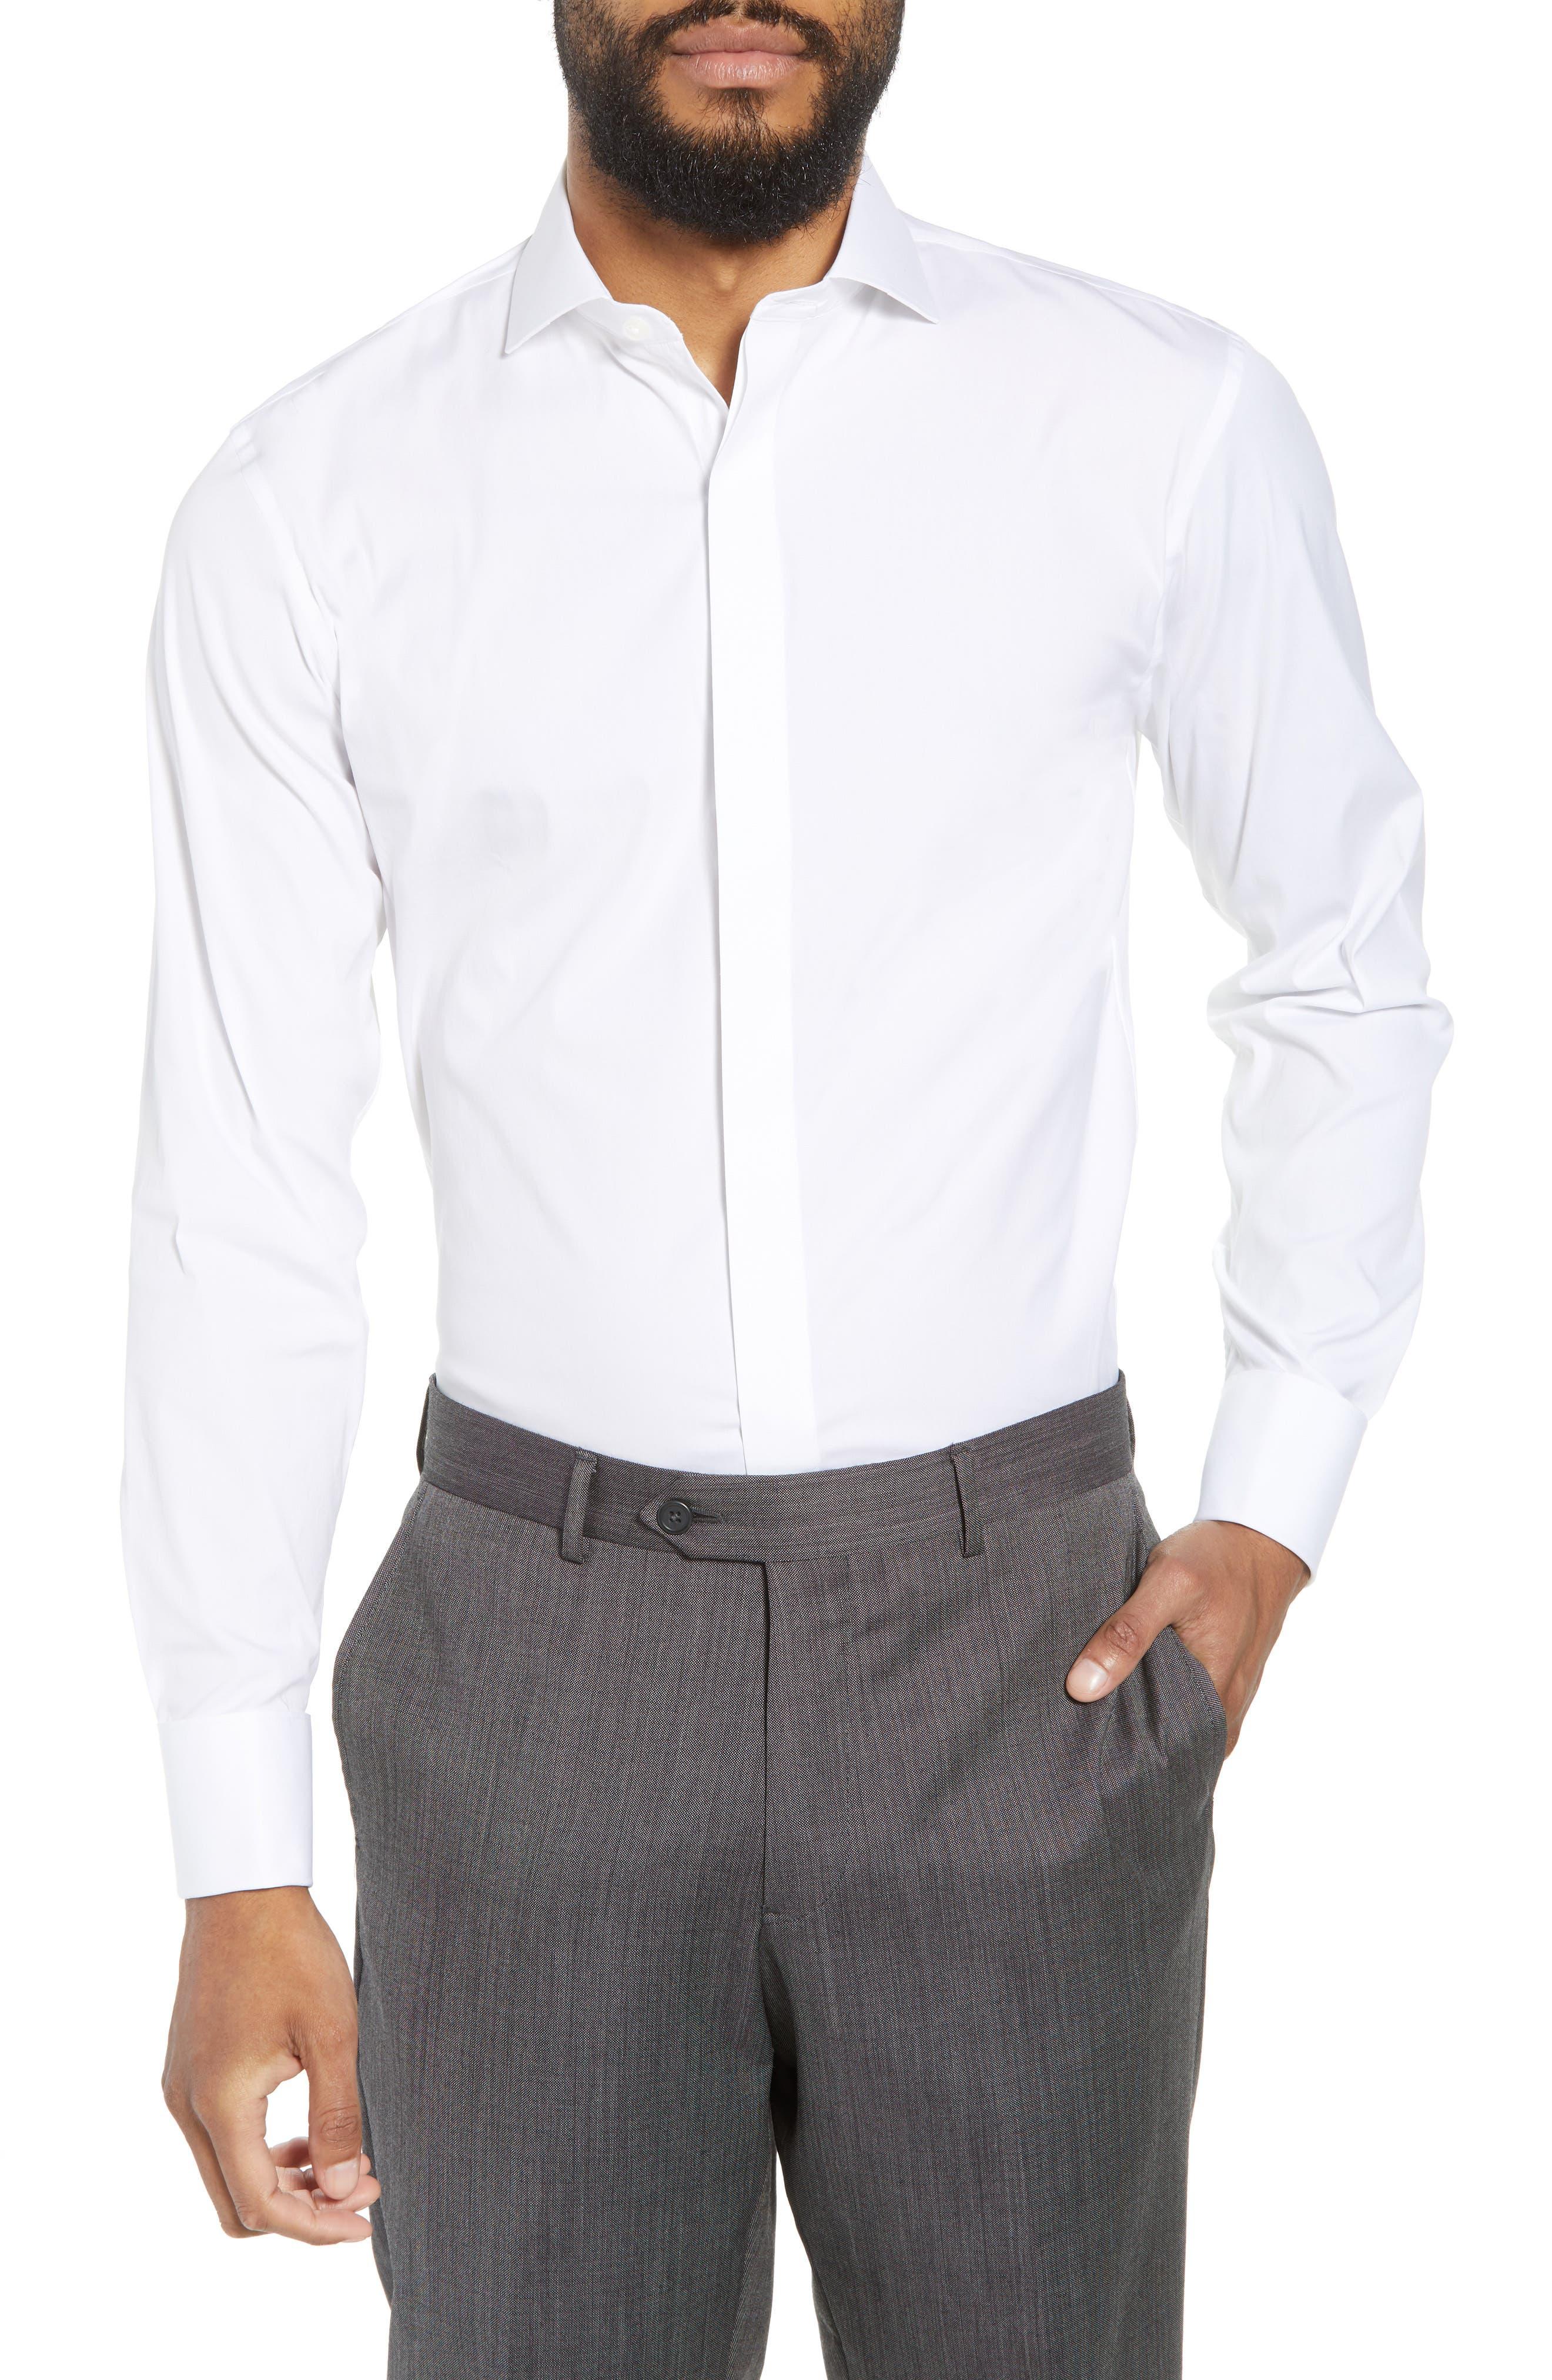 Capstone Stretch Slim Fit Tuxedo Shirt,                         Main,                         color, White